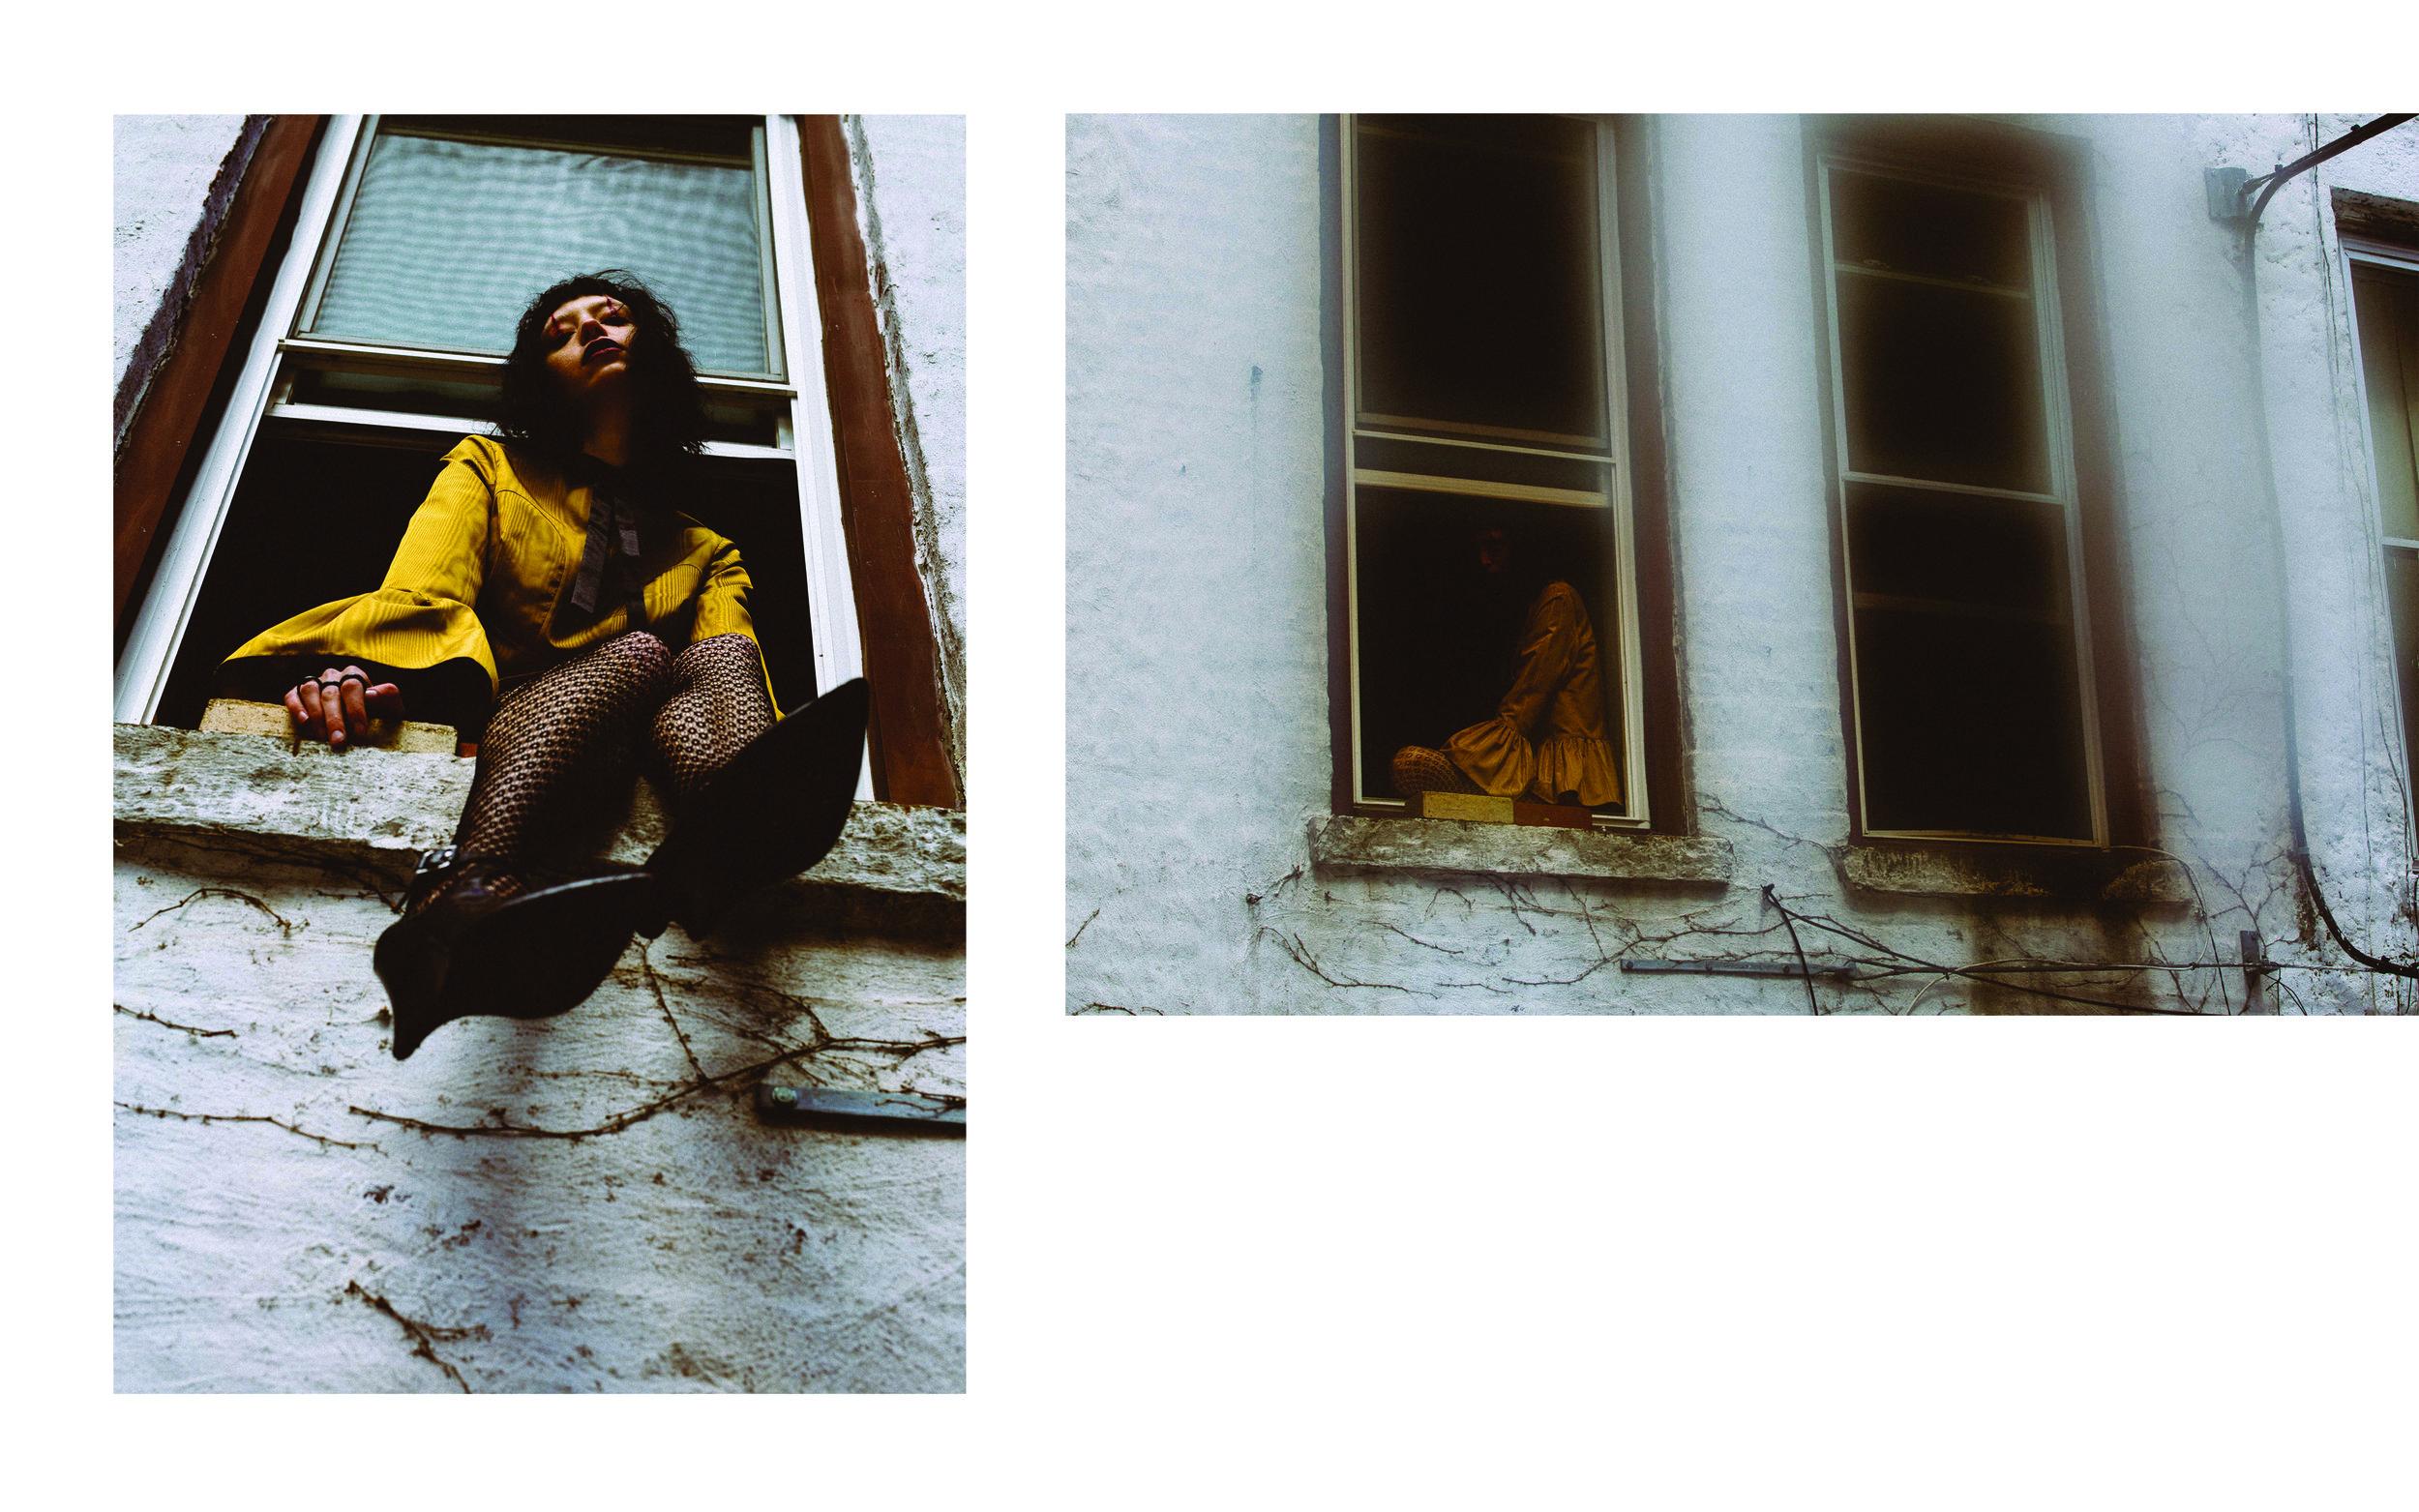 kelsey randall gold yellow silk moire blouse ruffle hem sweetheart neck line 3/4 length sleeve bell flounce gathered full sleeve cuff exposed gold zipper hardware back detail